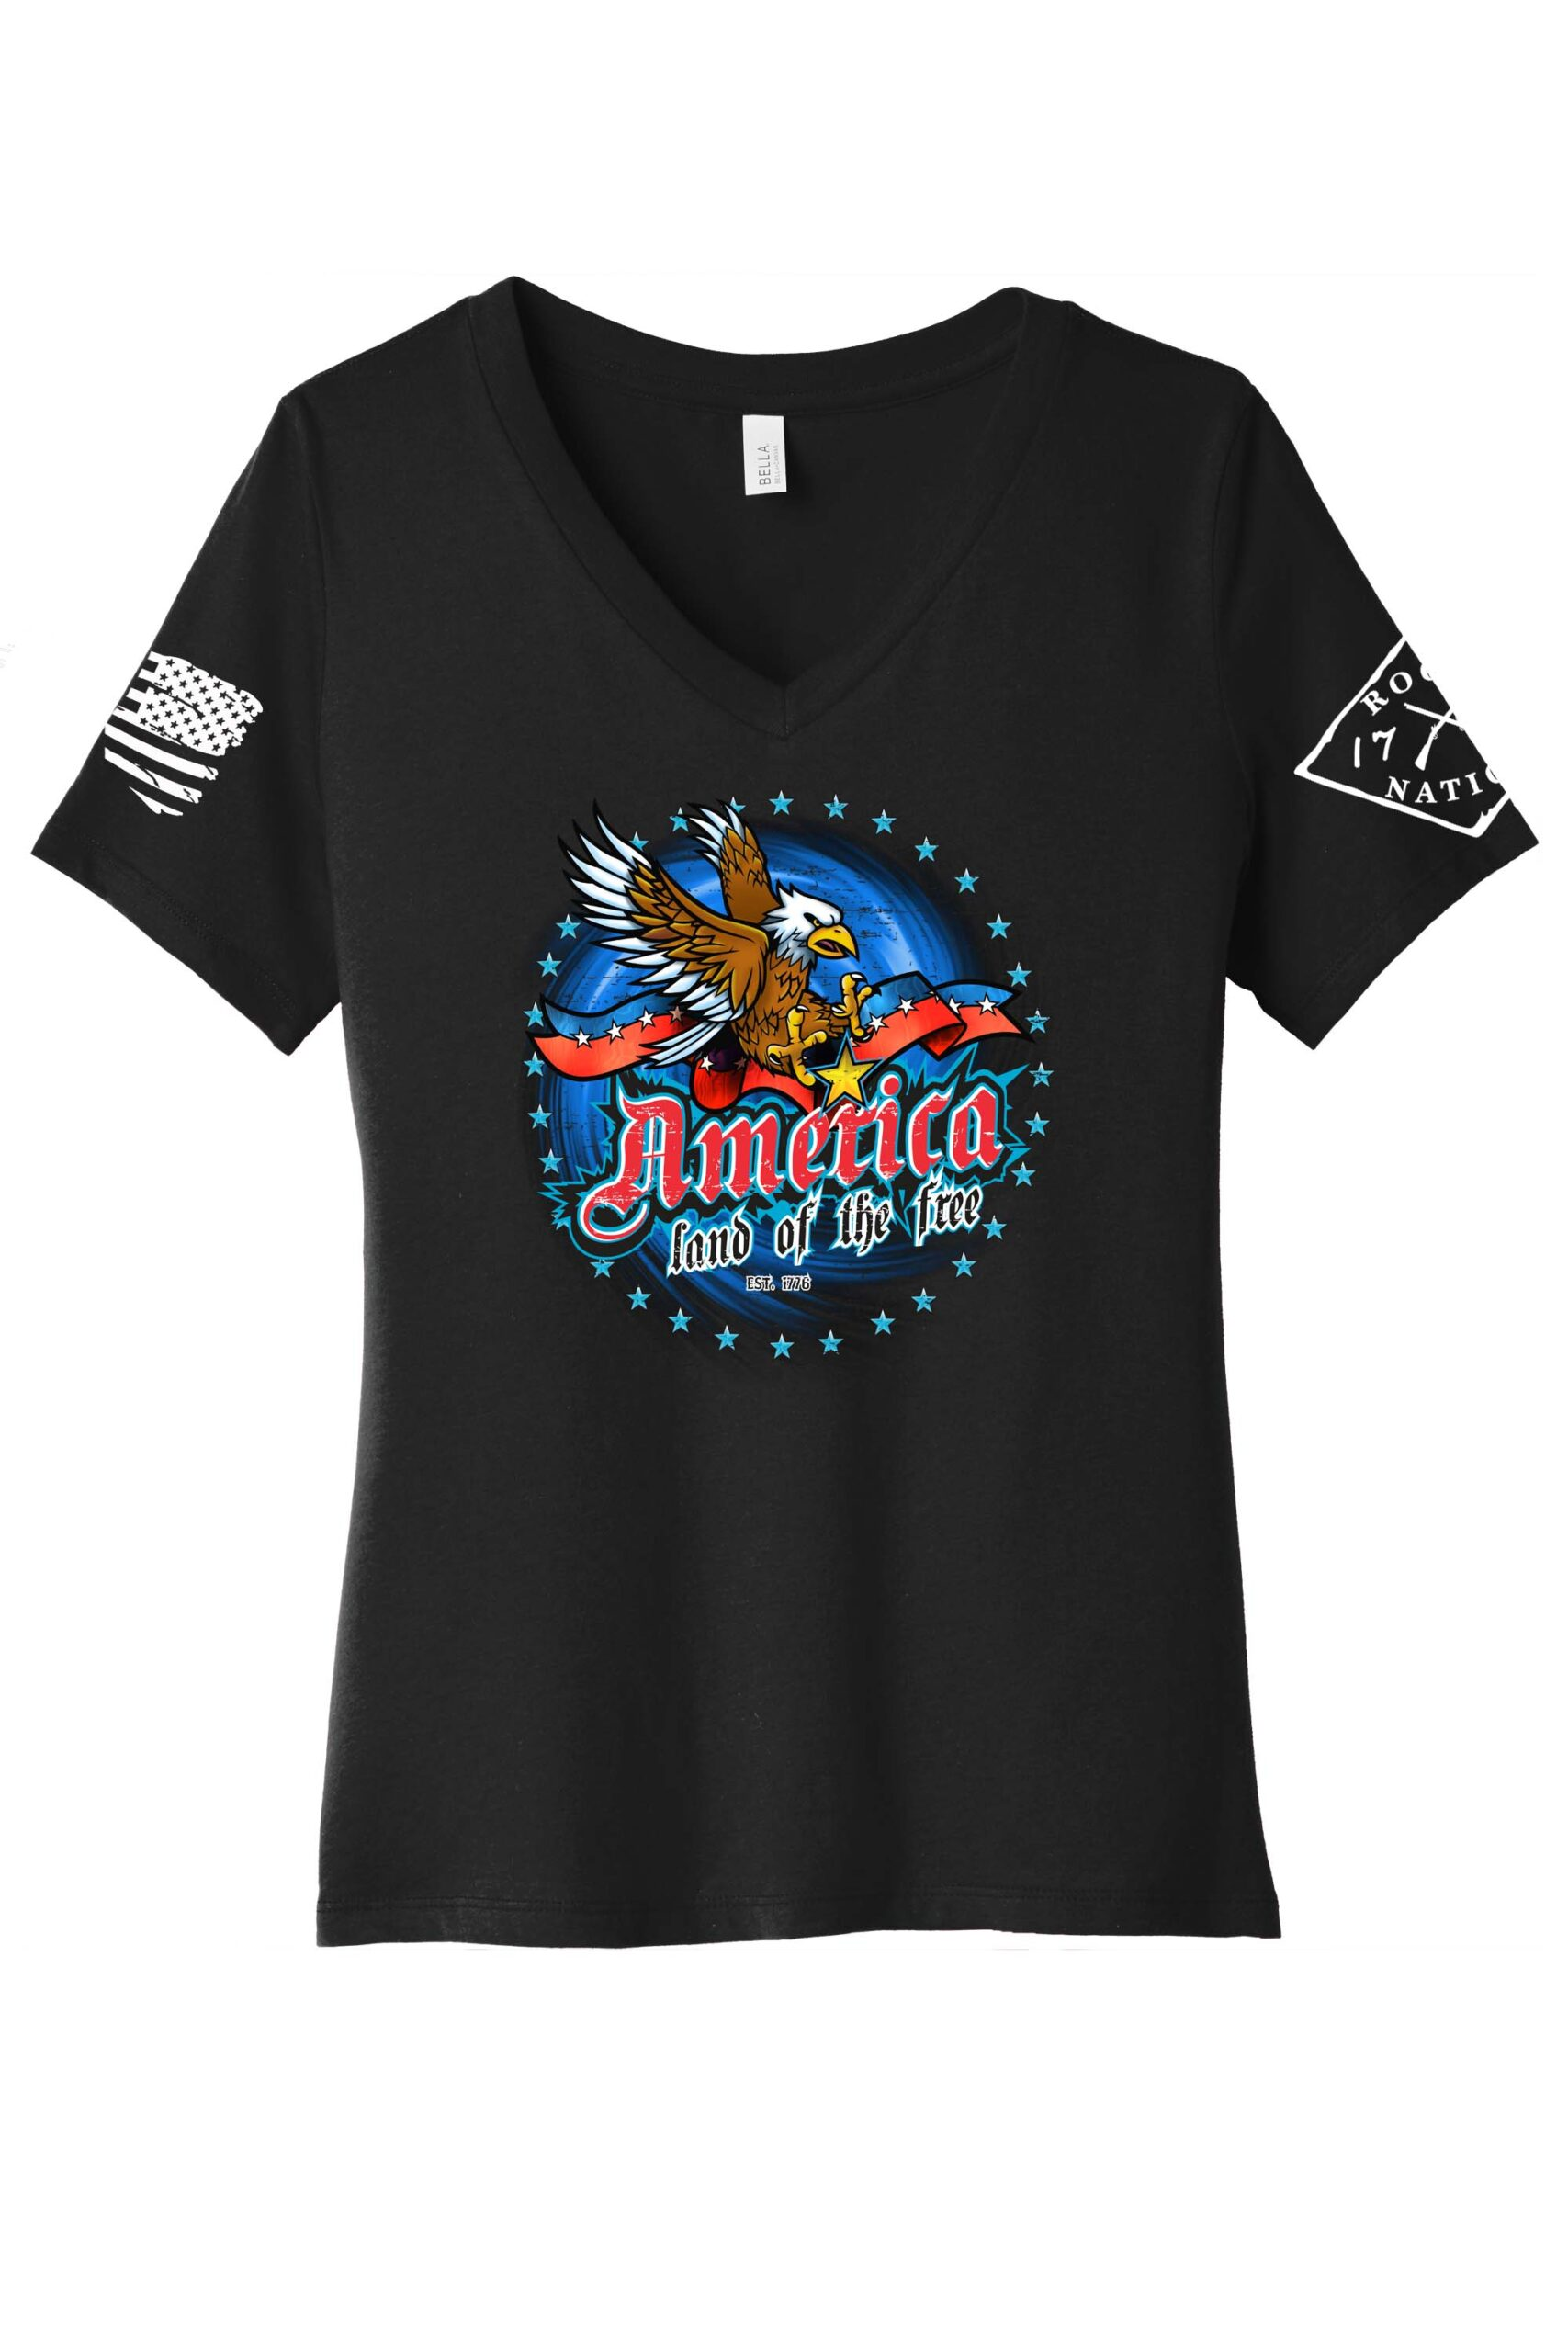 America Land of the Free Vneck in Black